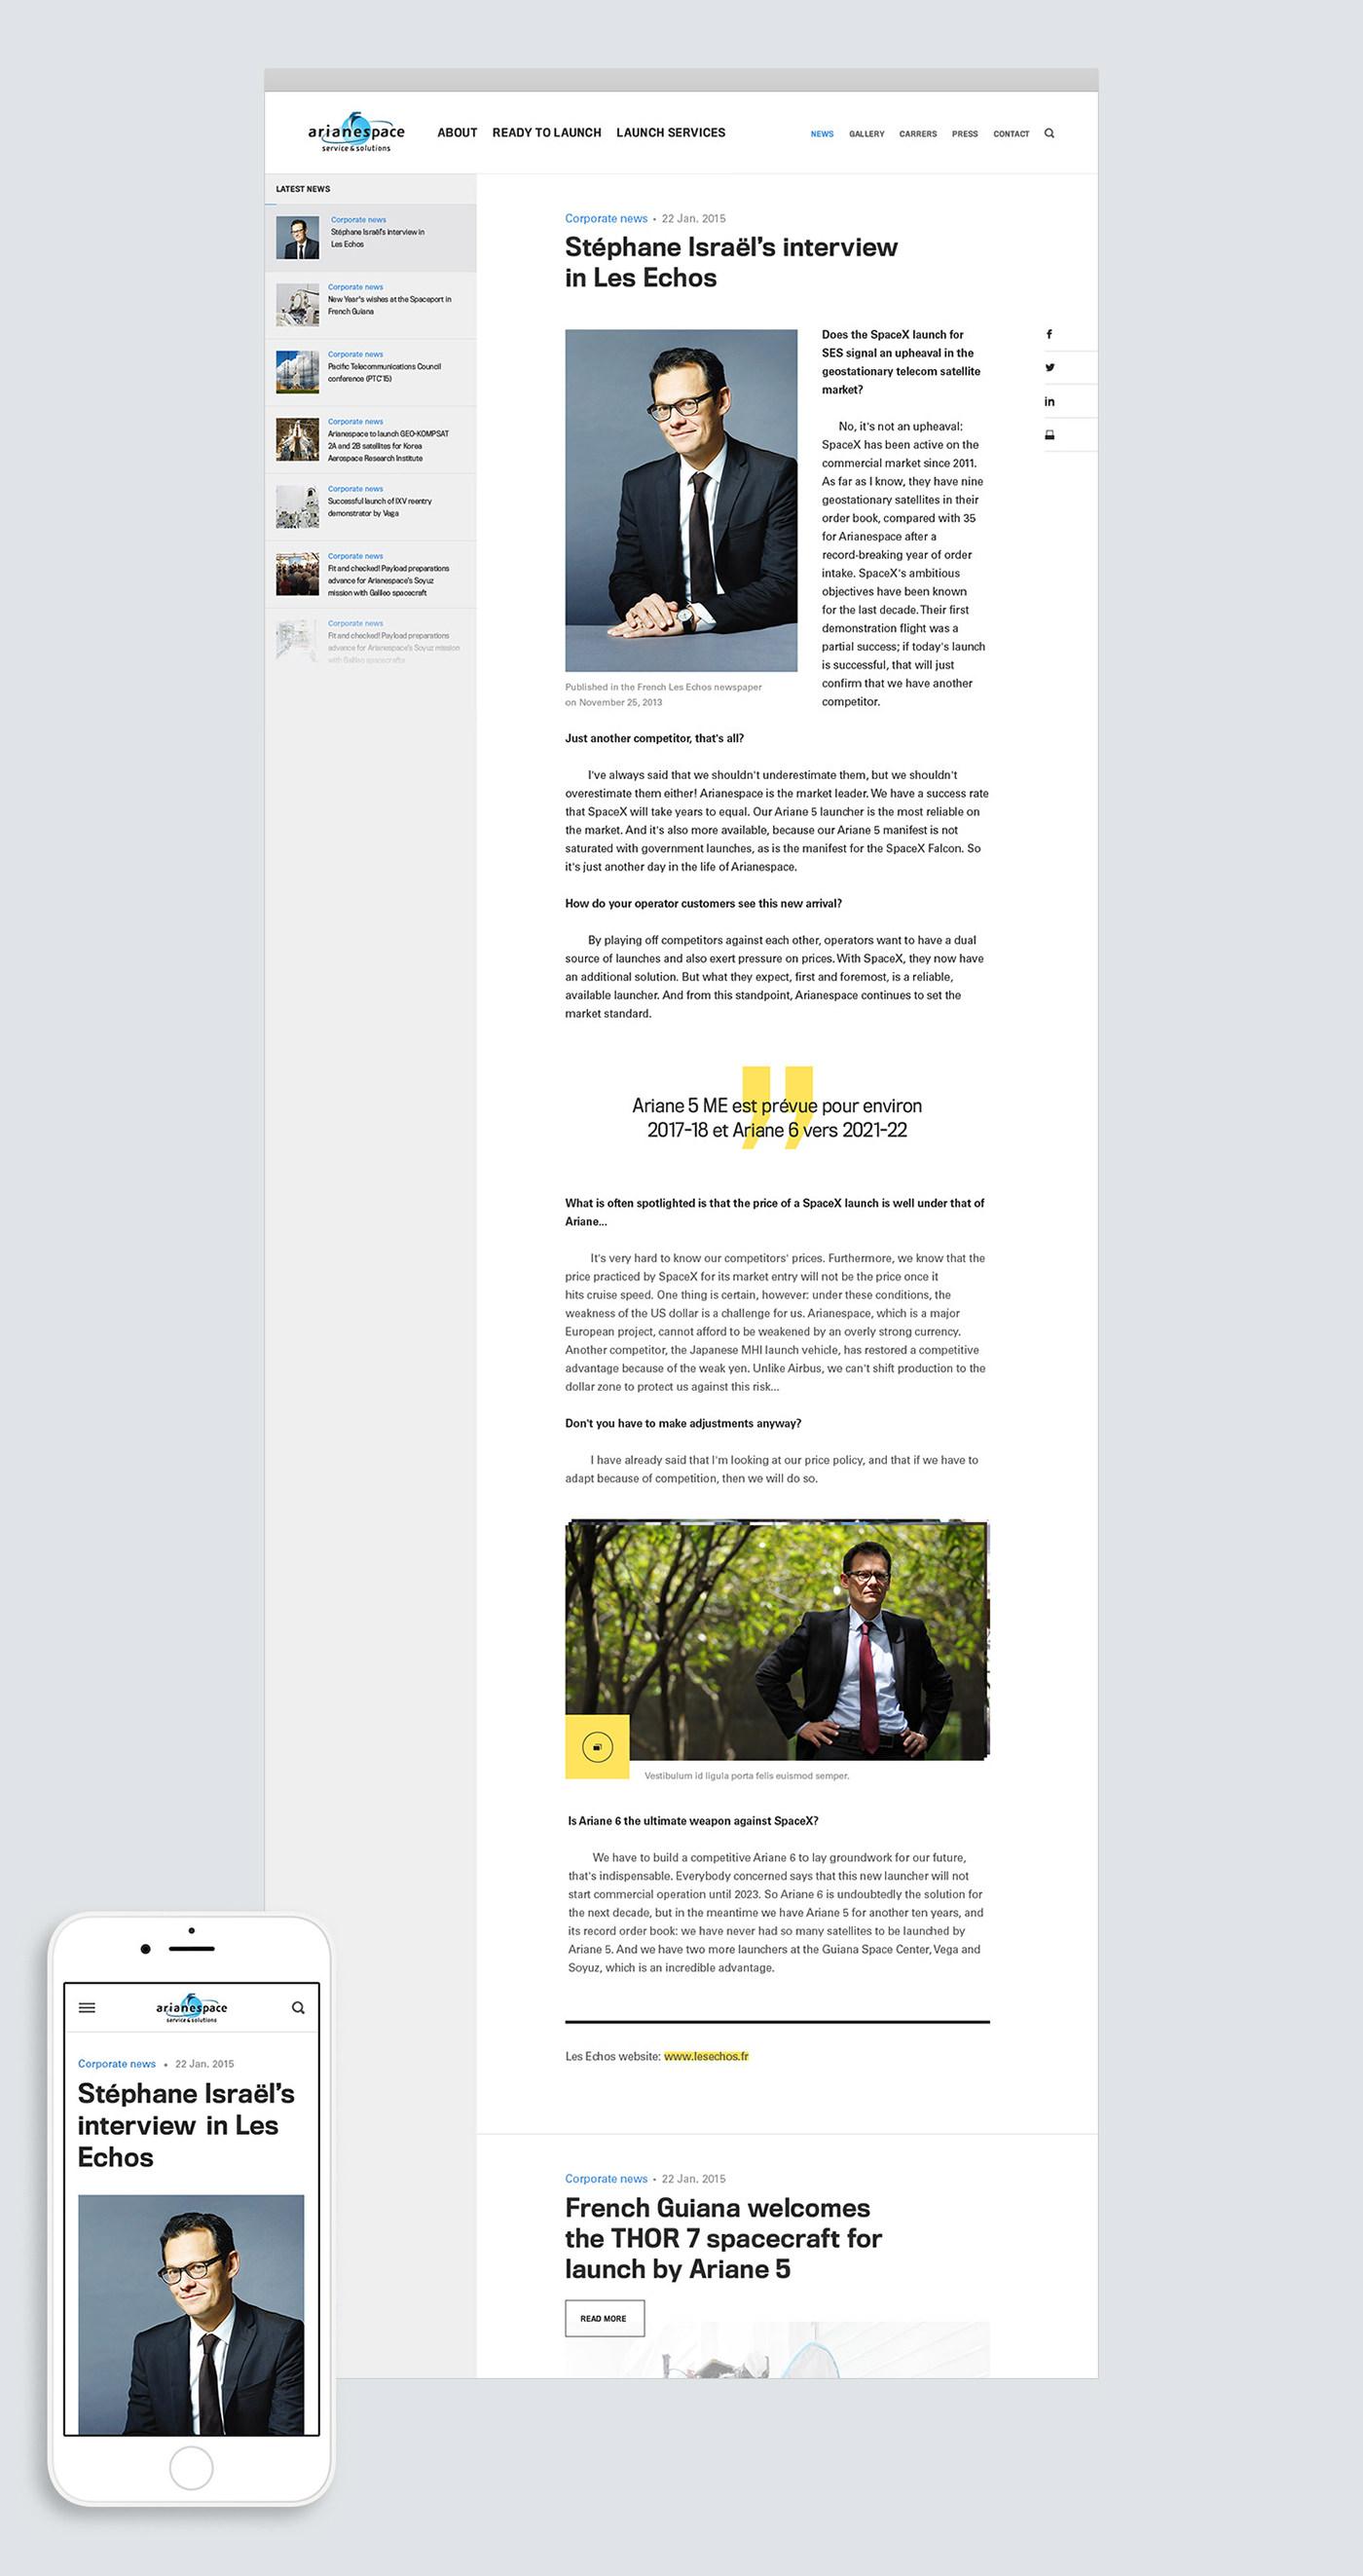 Space  rocket Satelite corporate compagny launcher Ariane Soyuz vega Webdesign Website mobile Responsive